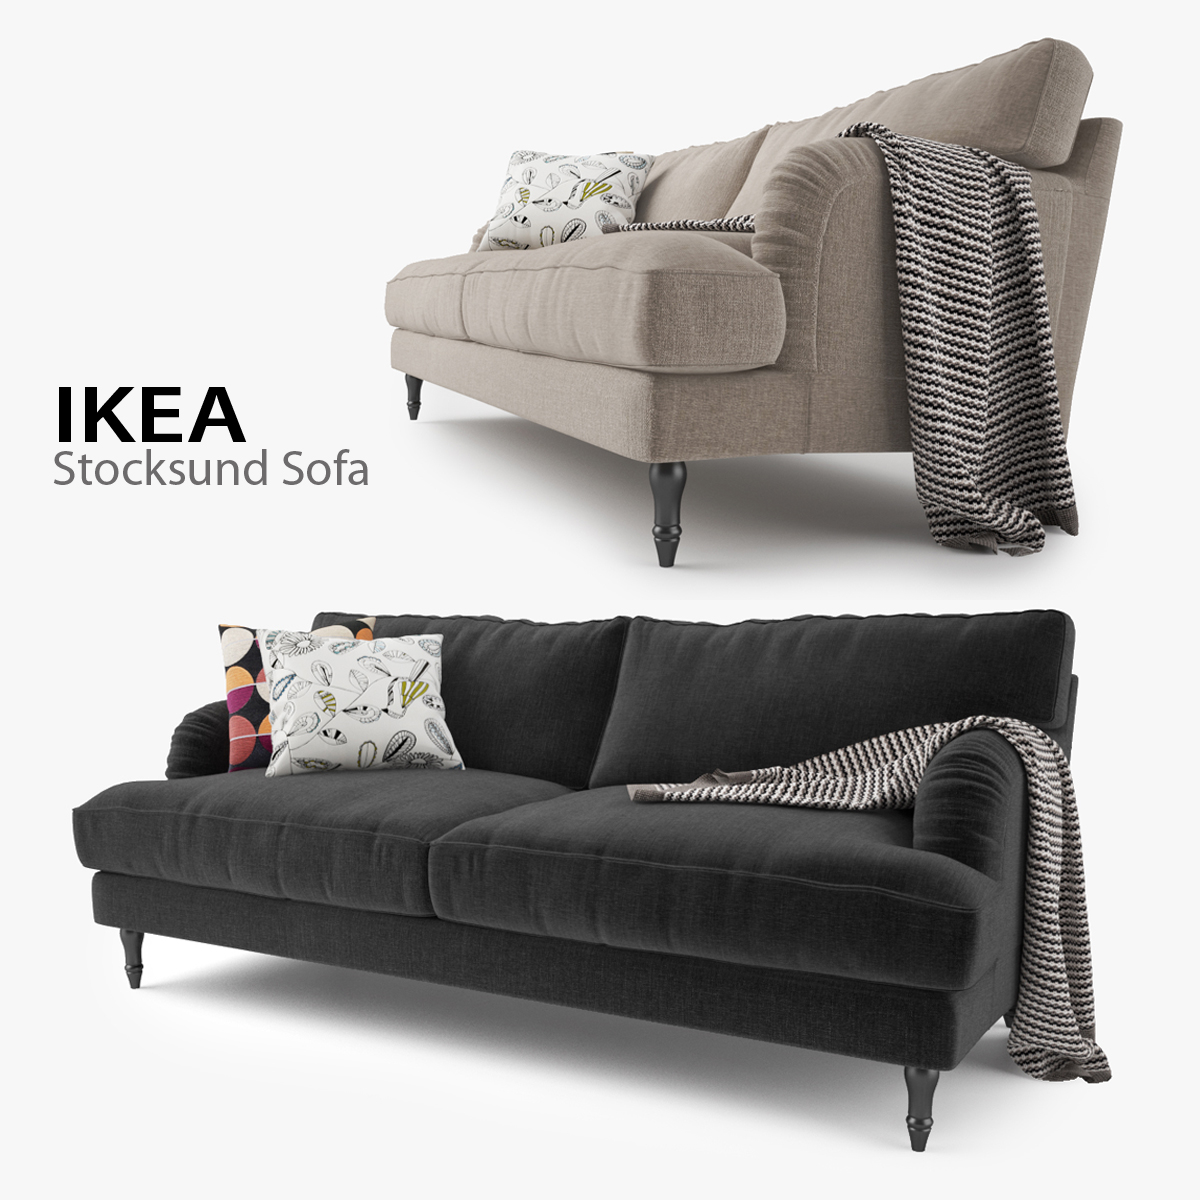 Magnificent Ikea Stocksund Sofa Dailytribune Chair Design For Home Dailytribuneorg